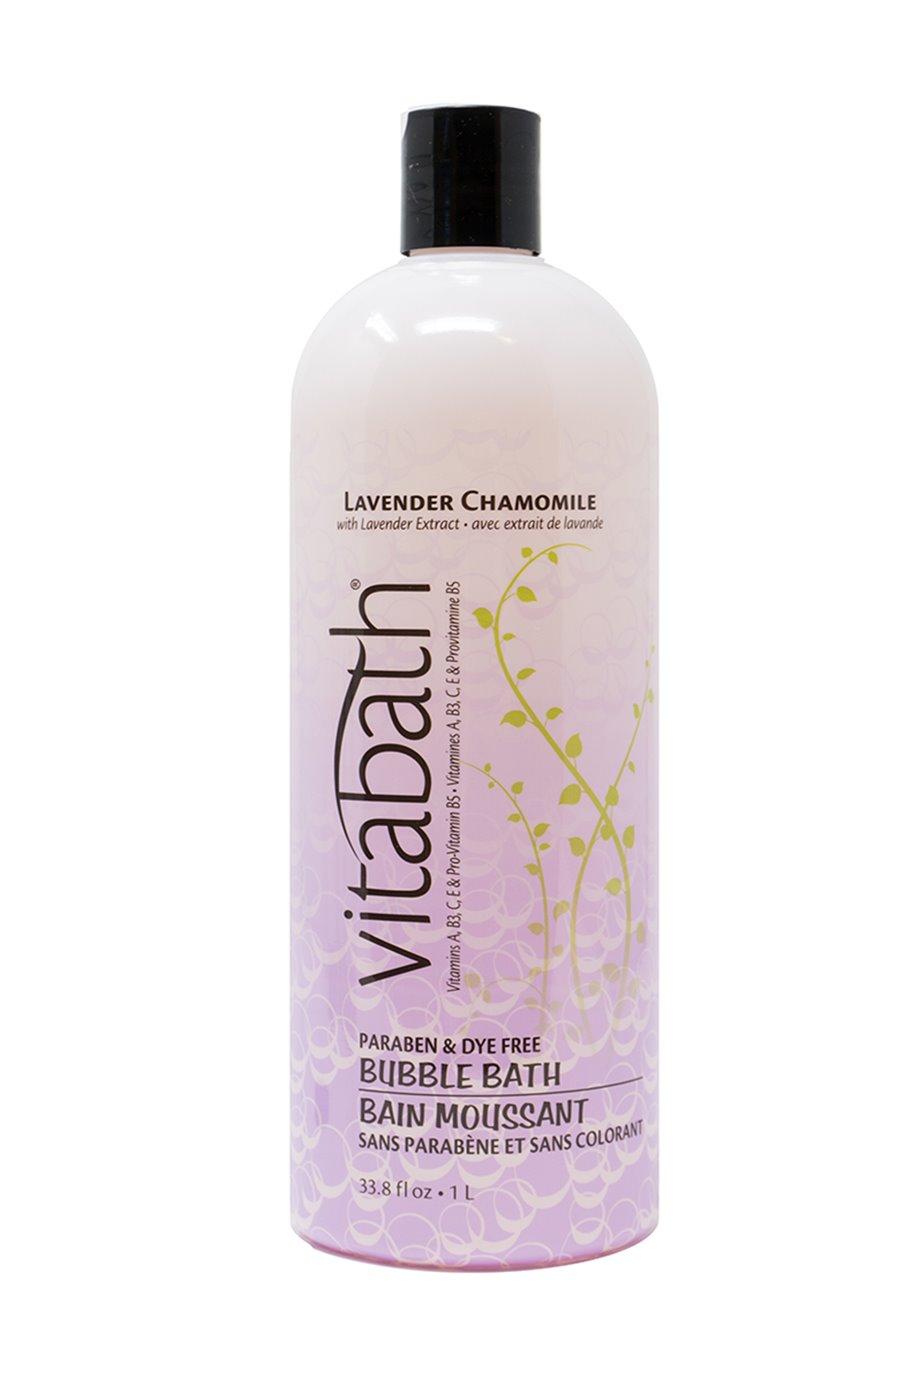 Vitabath Lavender Chamomile Bubble Bath (33.8 fl oz)